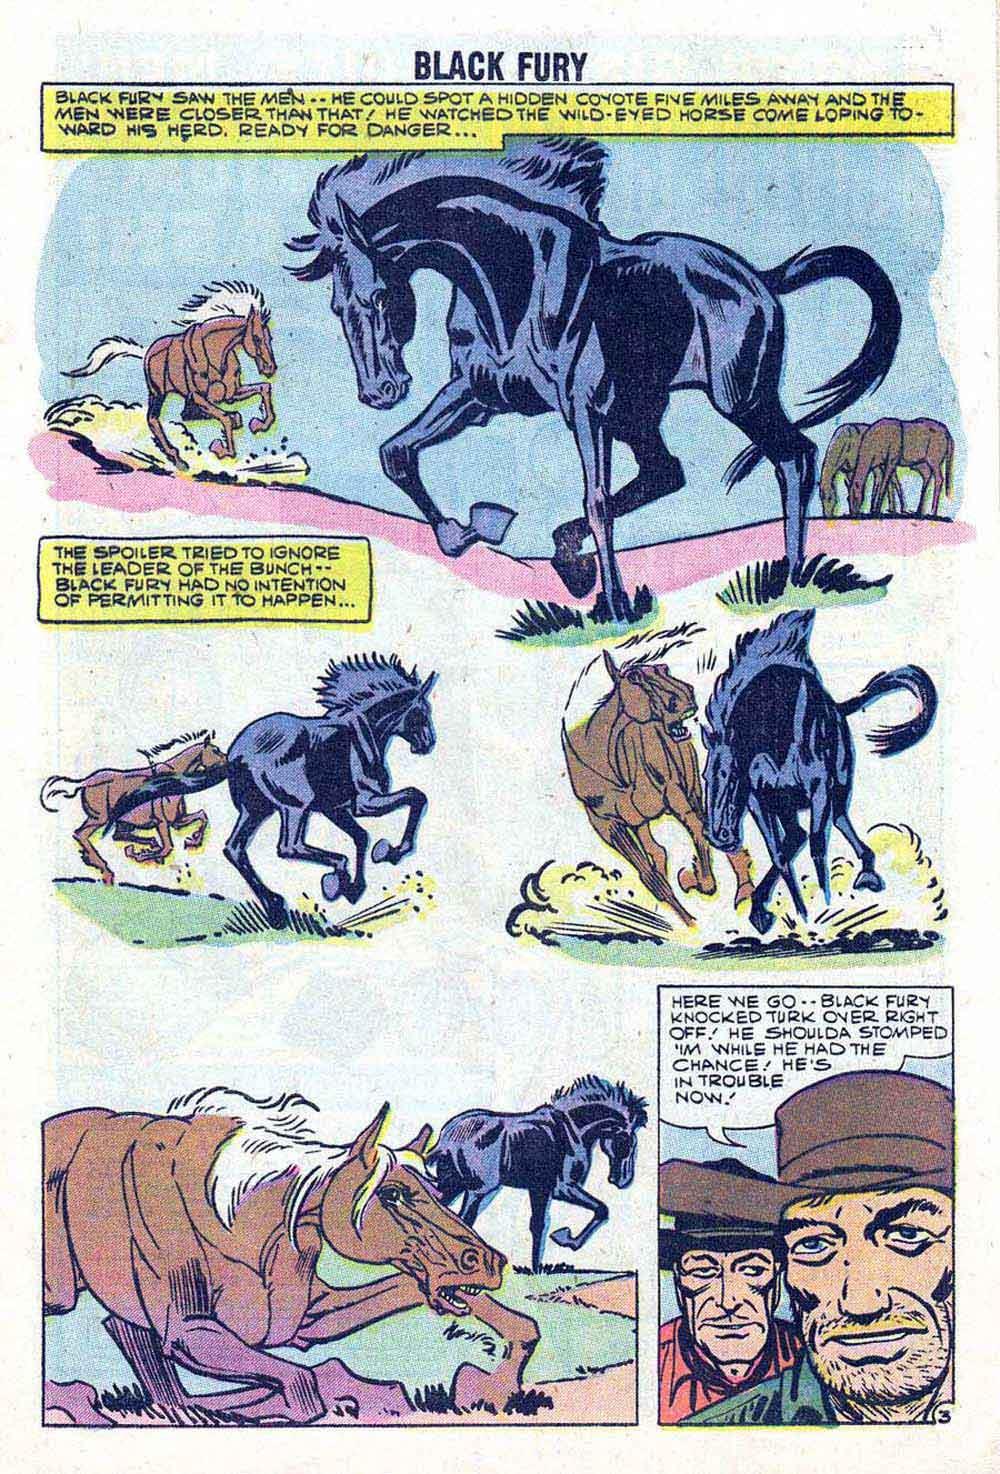 Black Fury v1 #17 charlton comic book page art by Steve Ditko